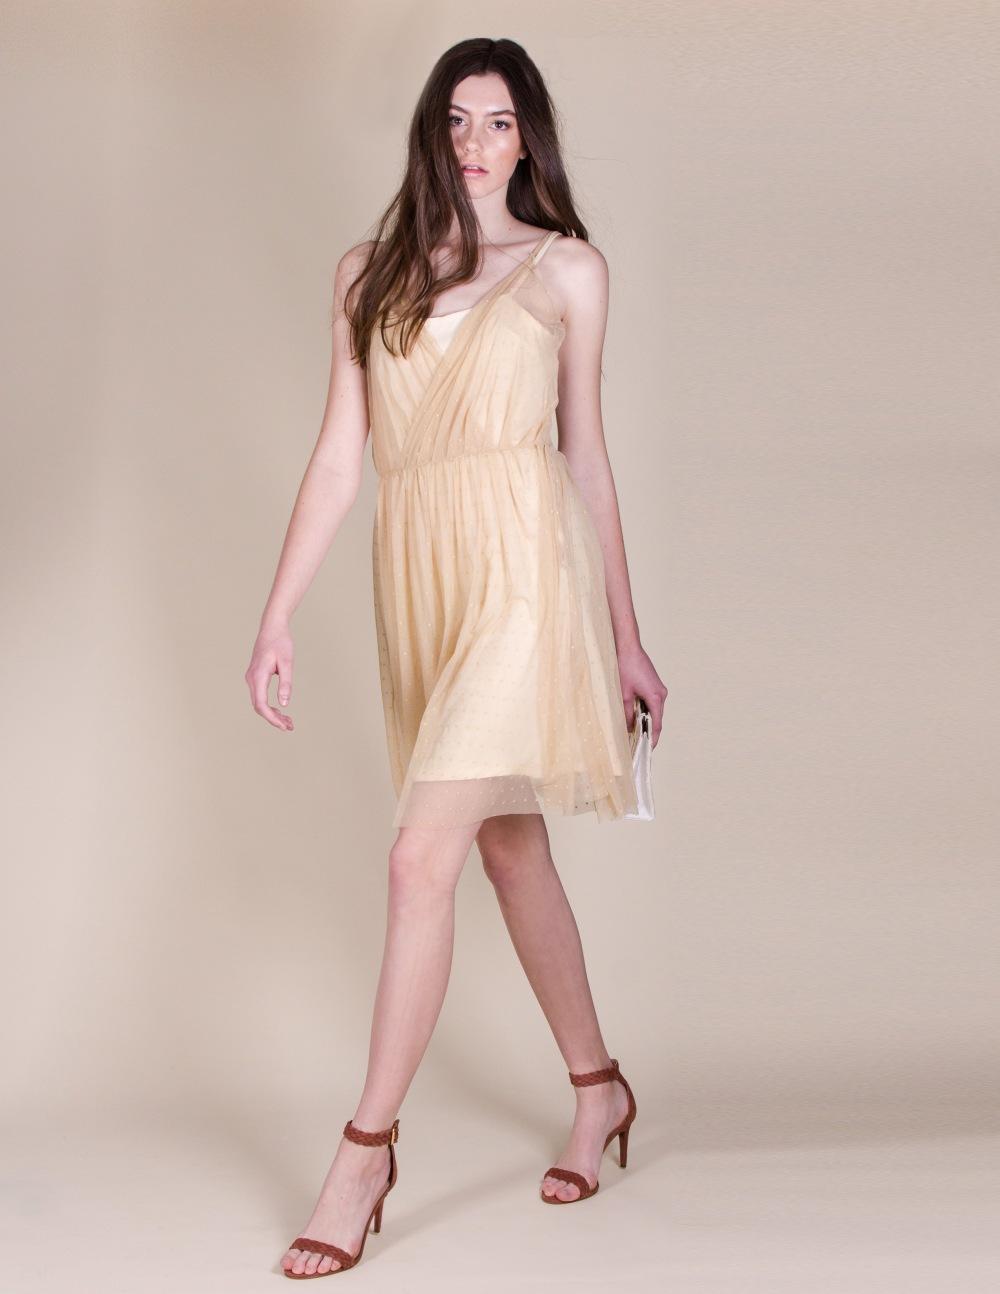 Alyssa Nicole The Emily Dress 1